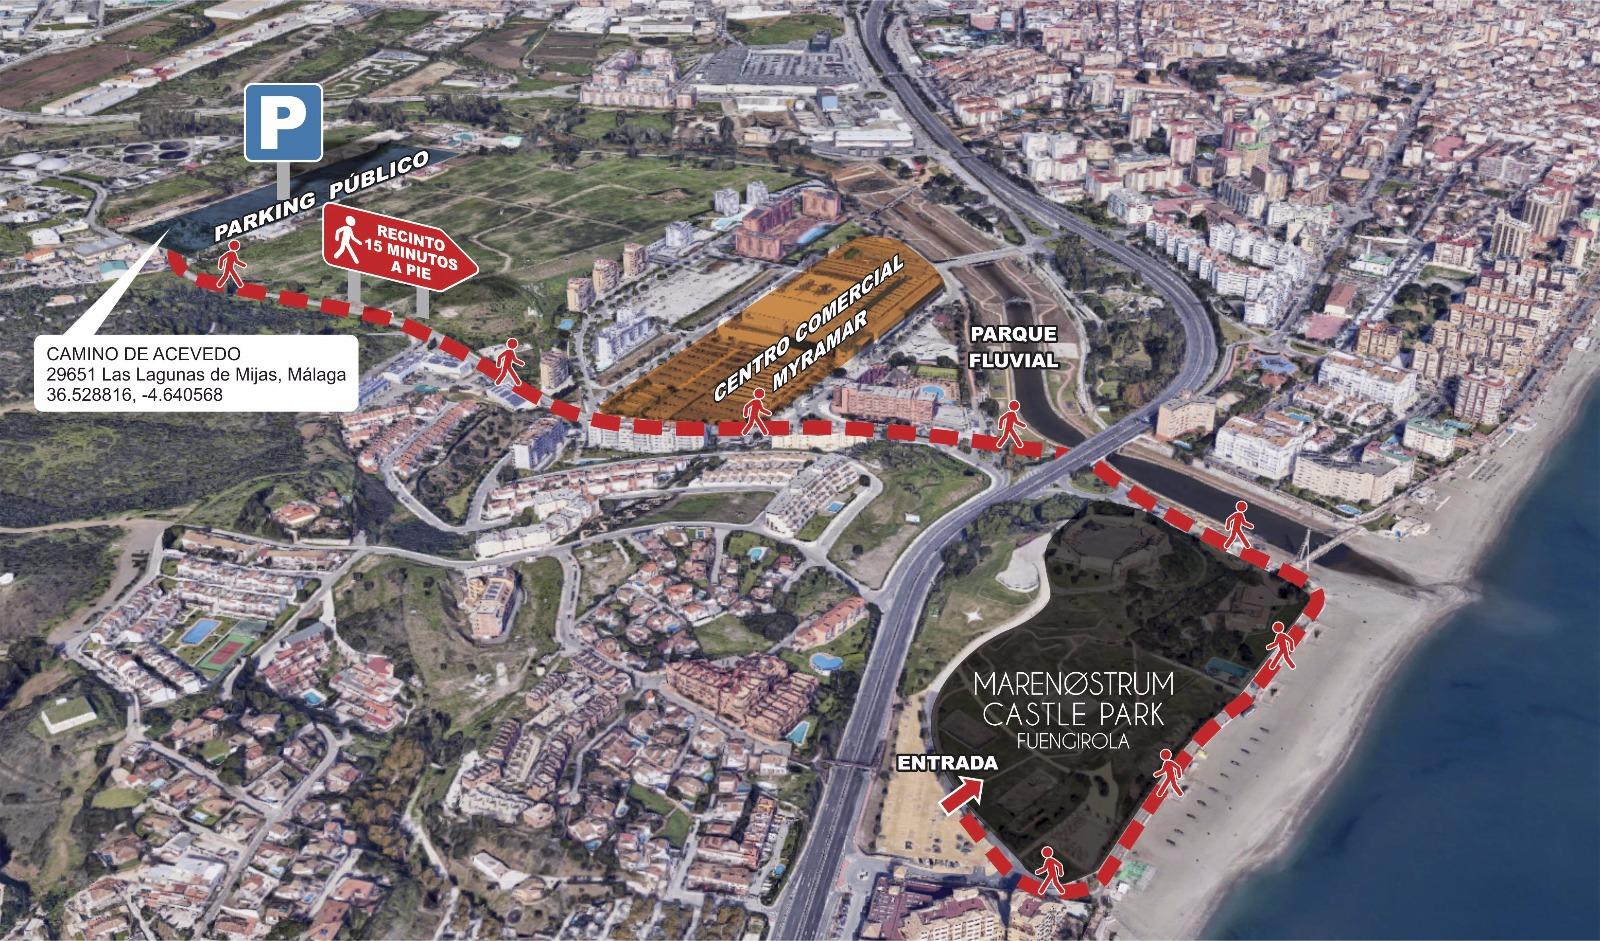 Mapa Parking Marenostrum Fuengirola